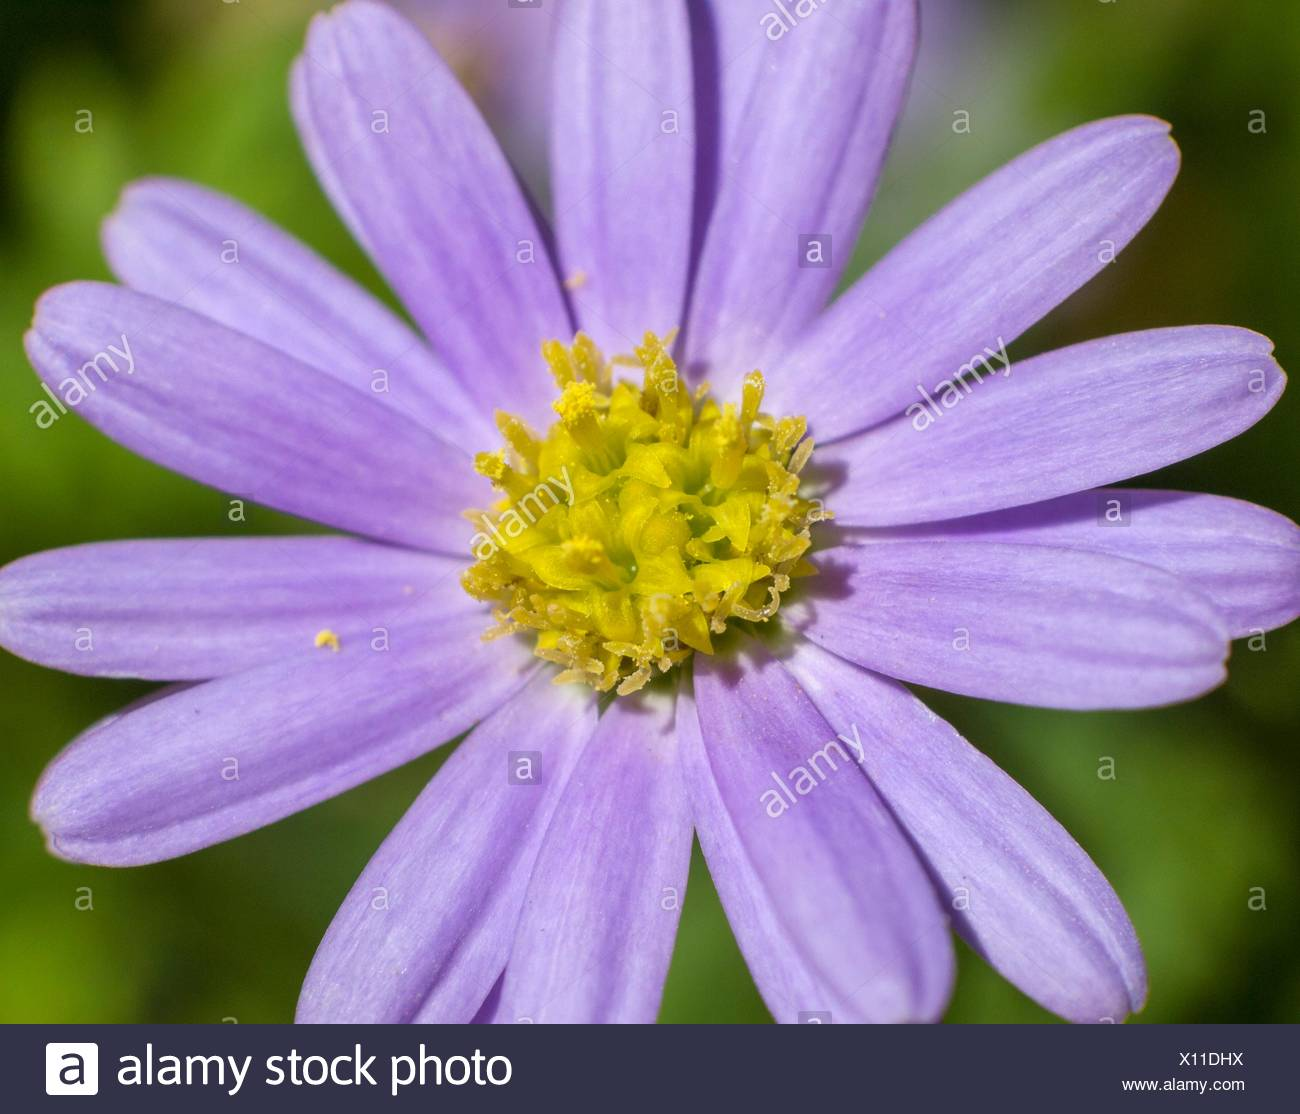 Magenta flower. Macro. - Stock Image